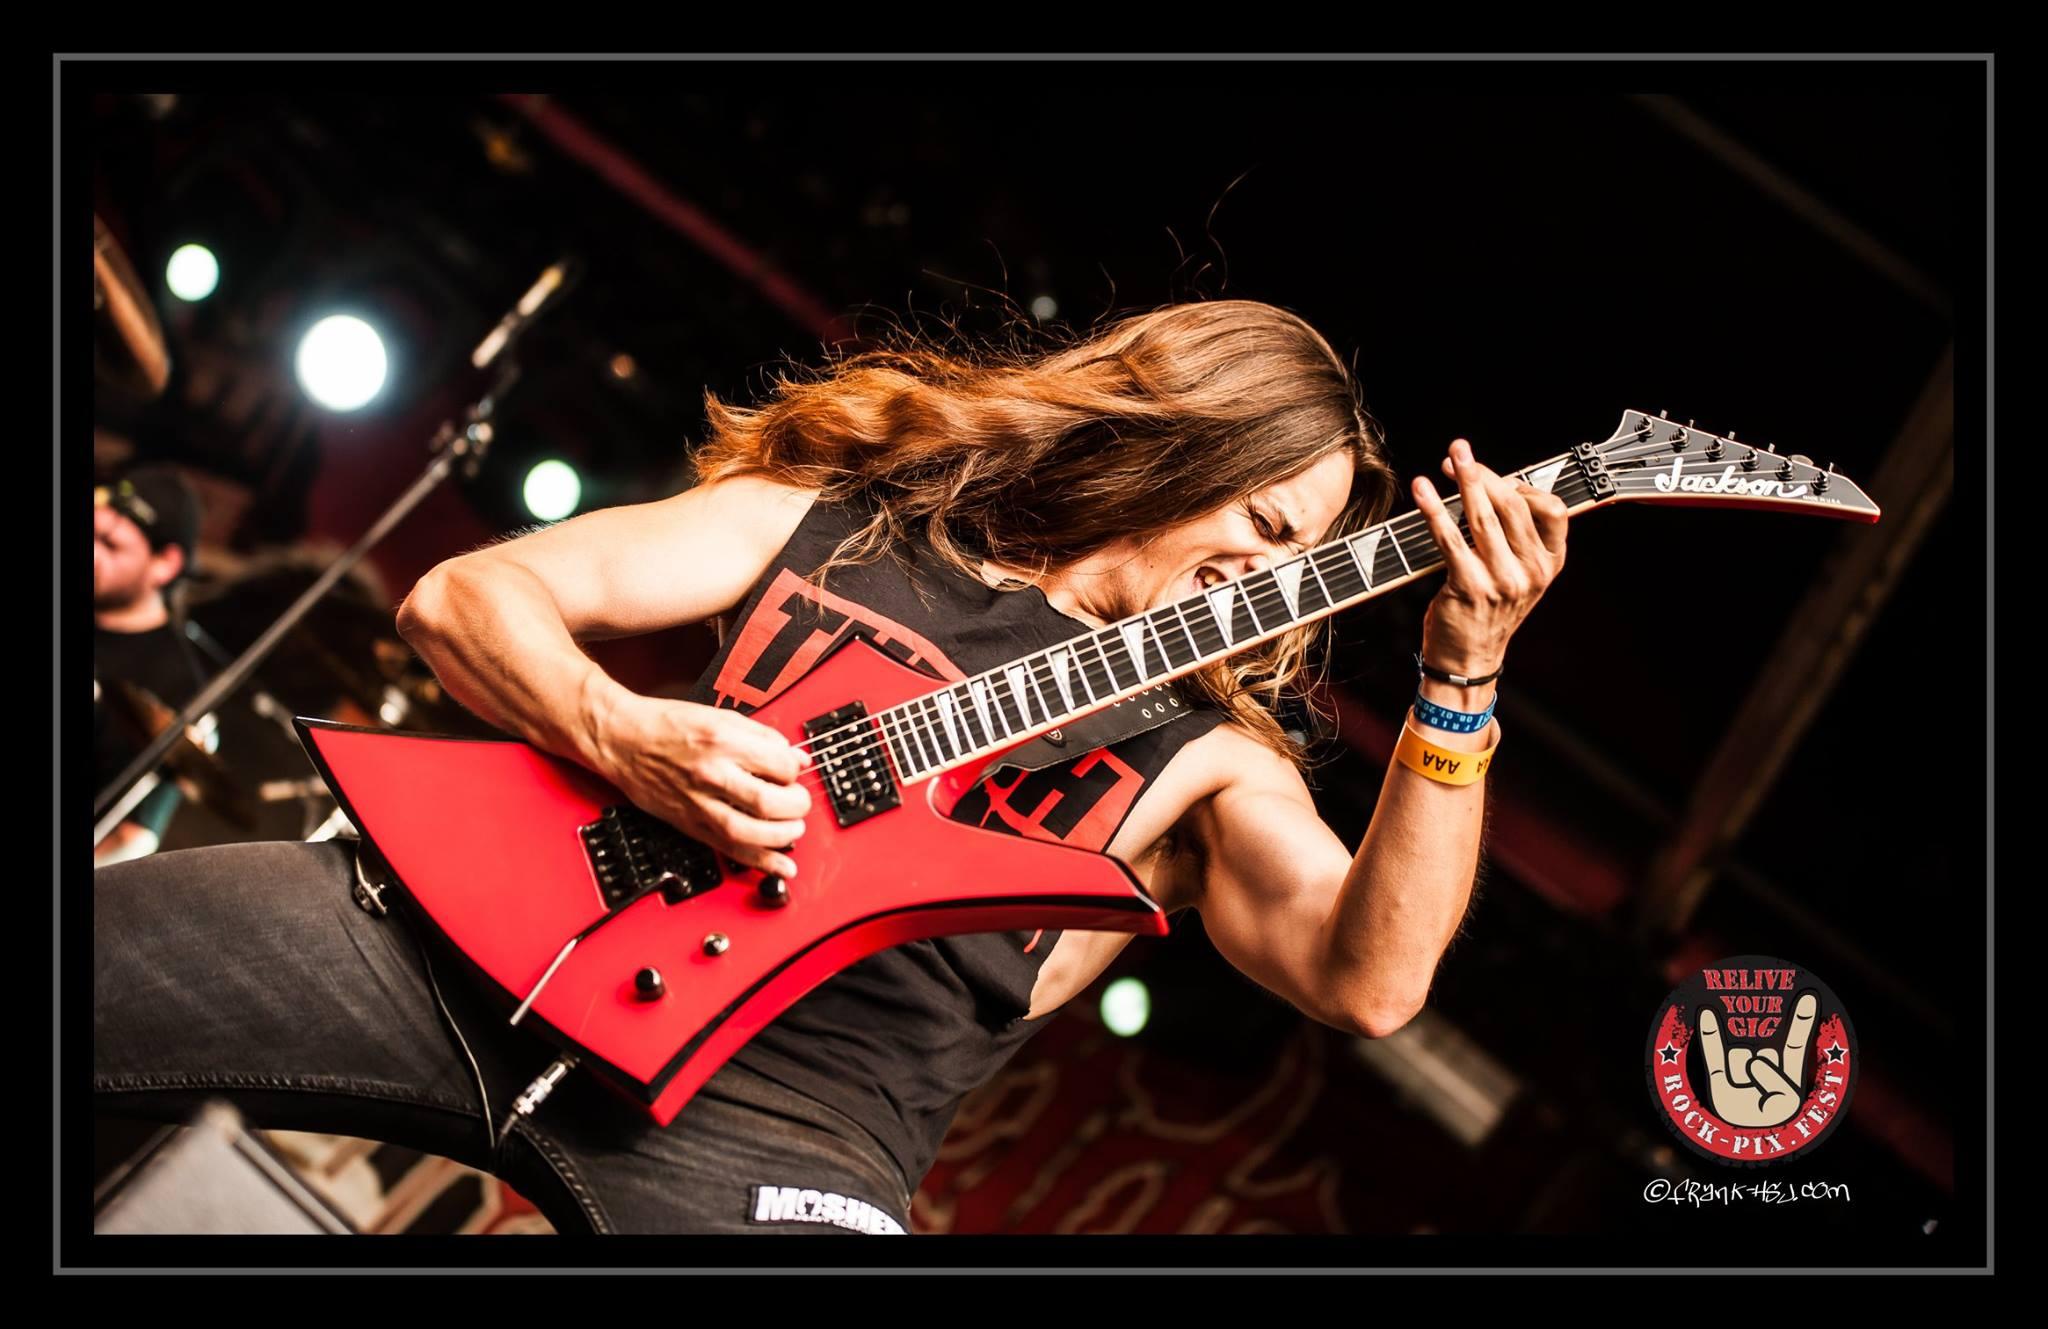 Gus Drax: Ο Λαρισαίος κιθαρίστας που «τα σπάει» σε Ελλάδα και εξωτερικό